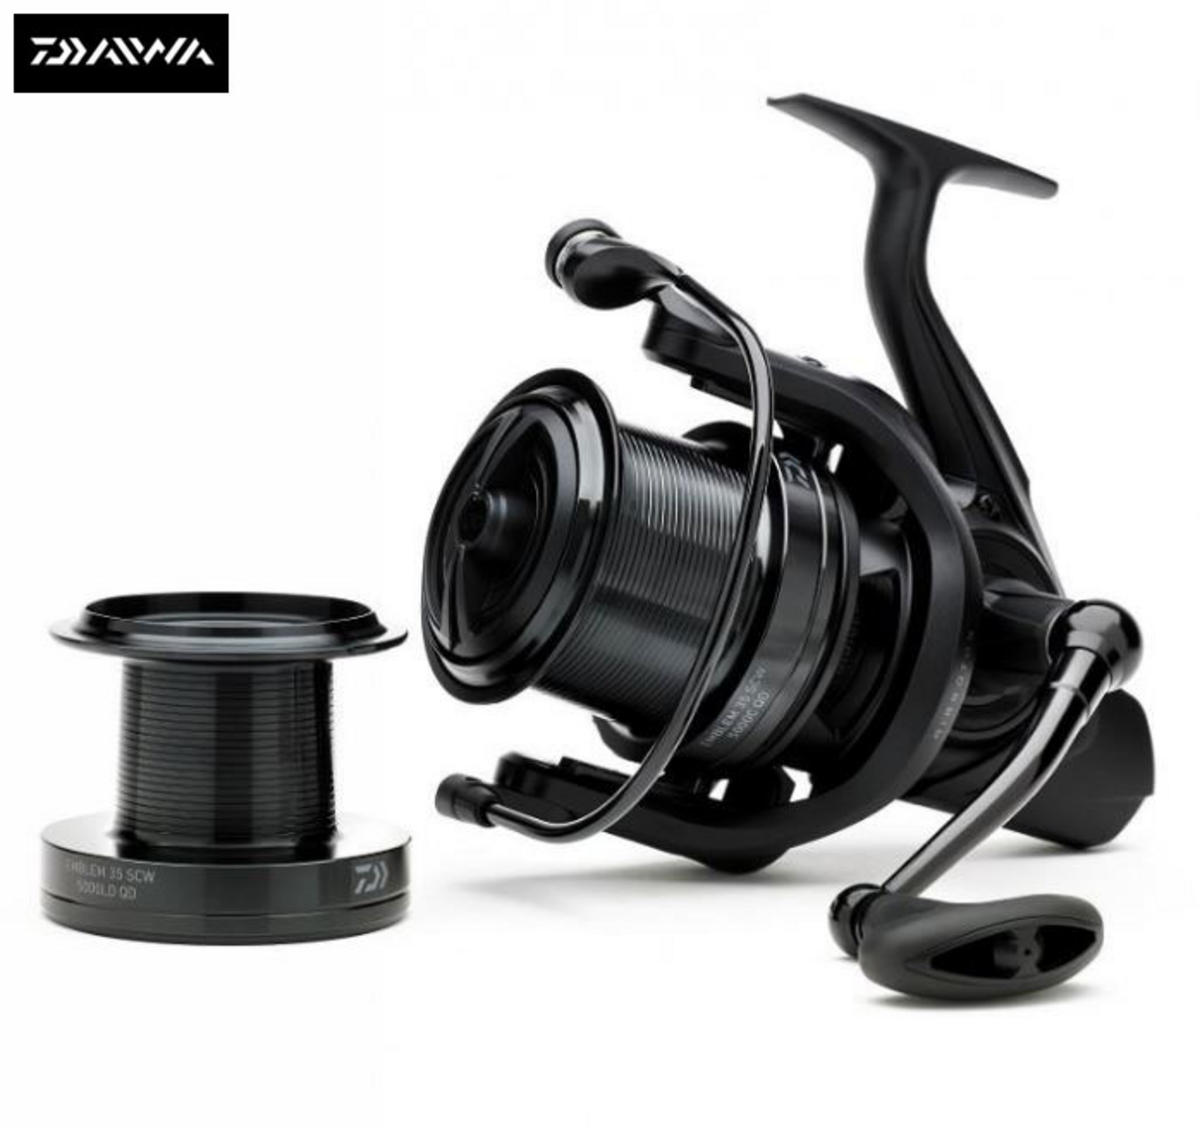 New Daiwa 18 Emblem 35 SCW 5000C QD Carp Fishing Reel - 18EM35SCW5000CQD